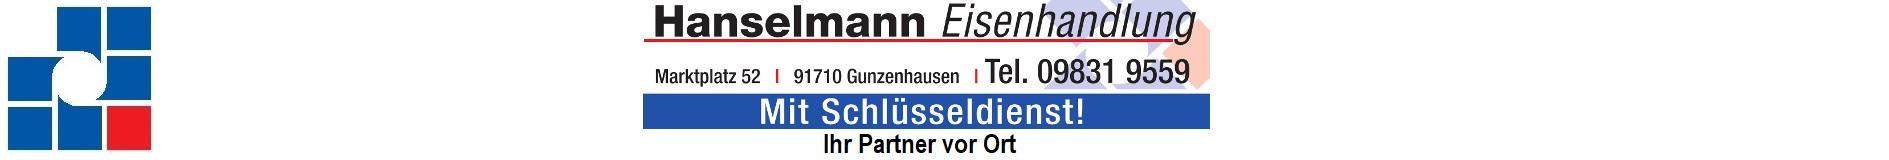 Hanselmann-Eisenhandlung